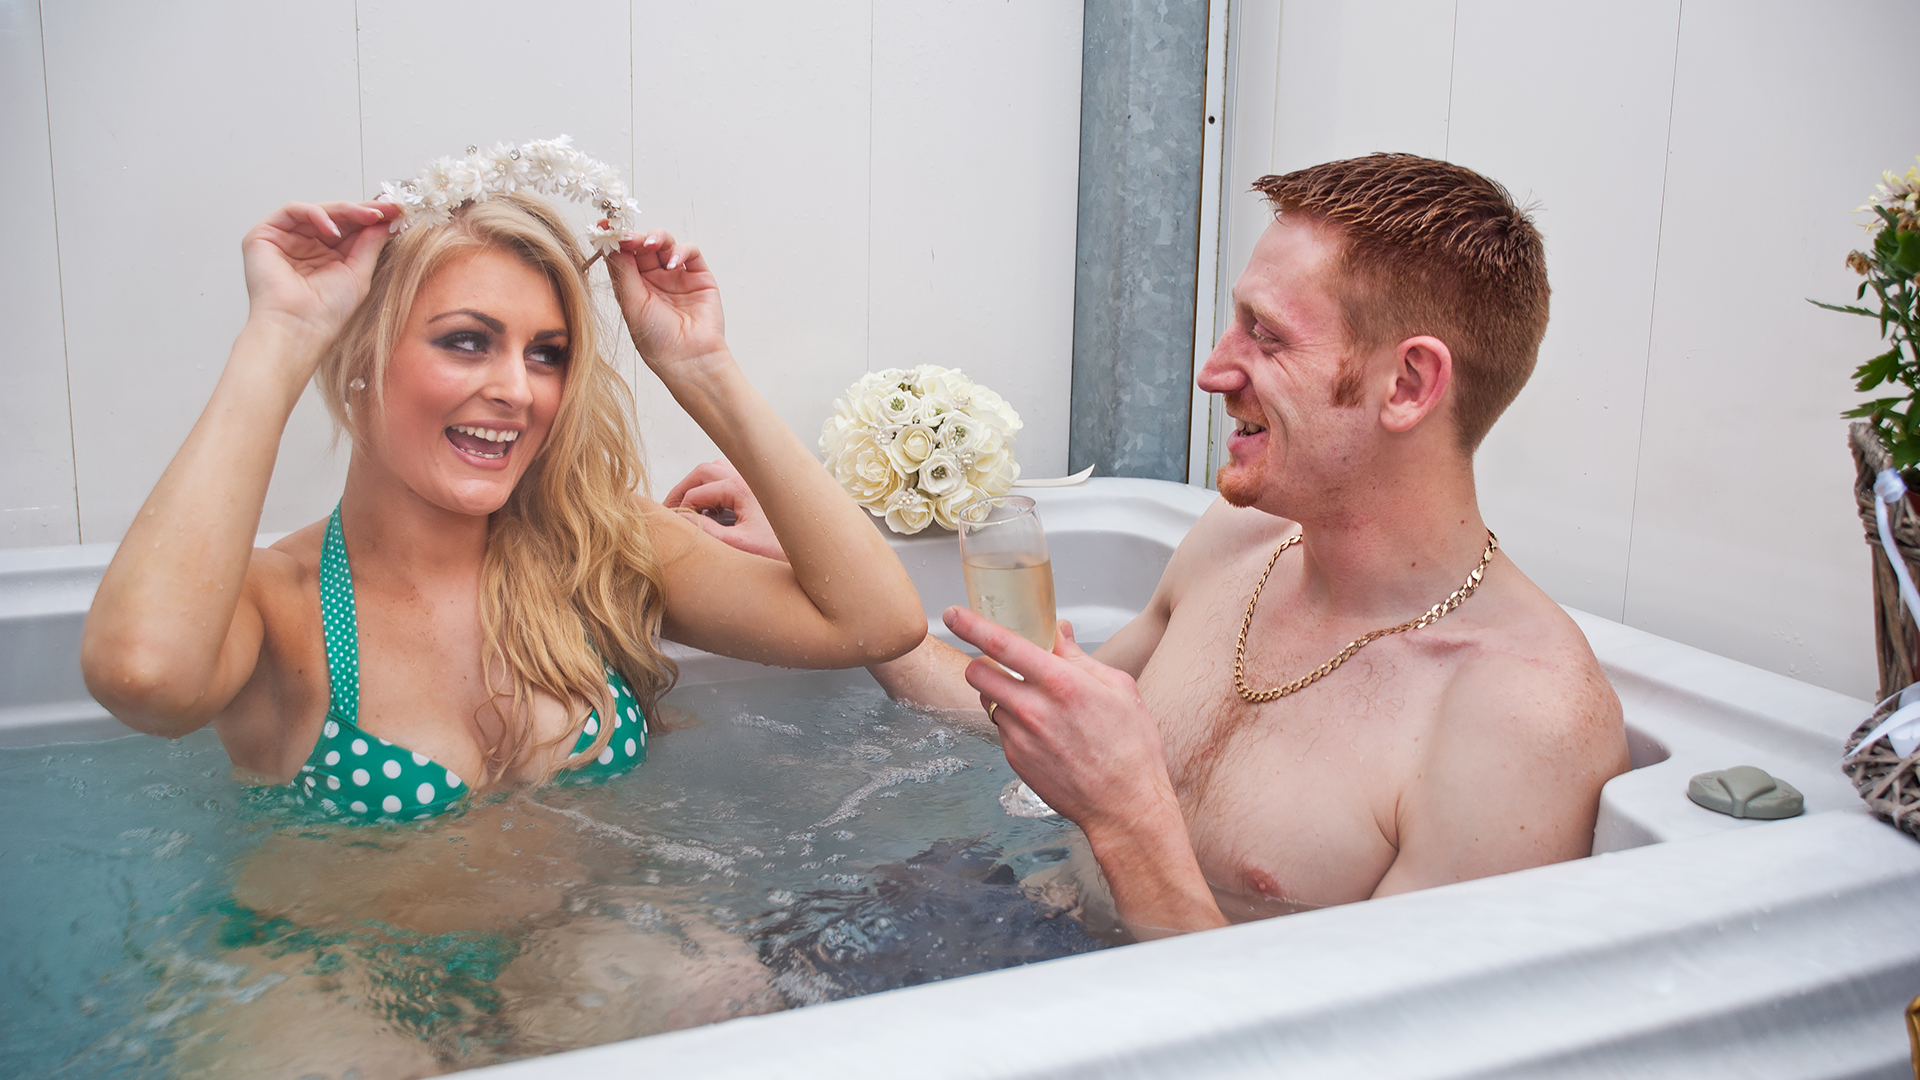 Couple Sharing Luxury Bath in Ensuite Bathroom enjoying complimentary wine